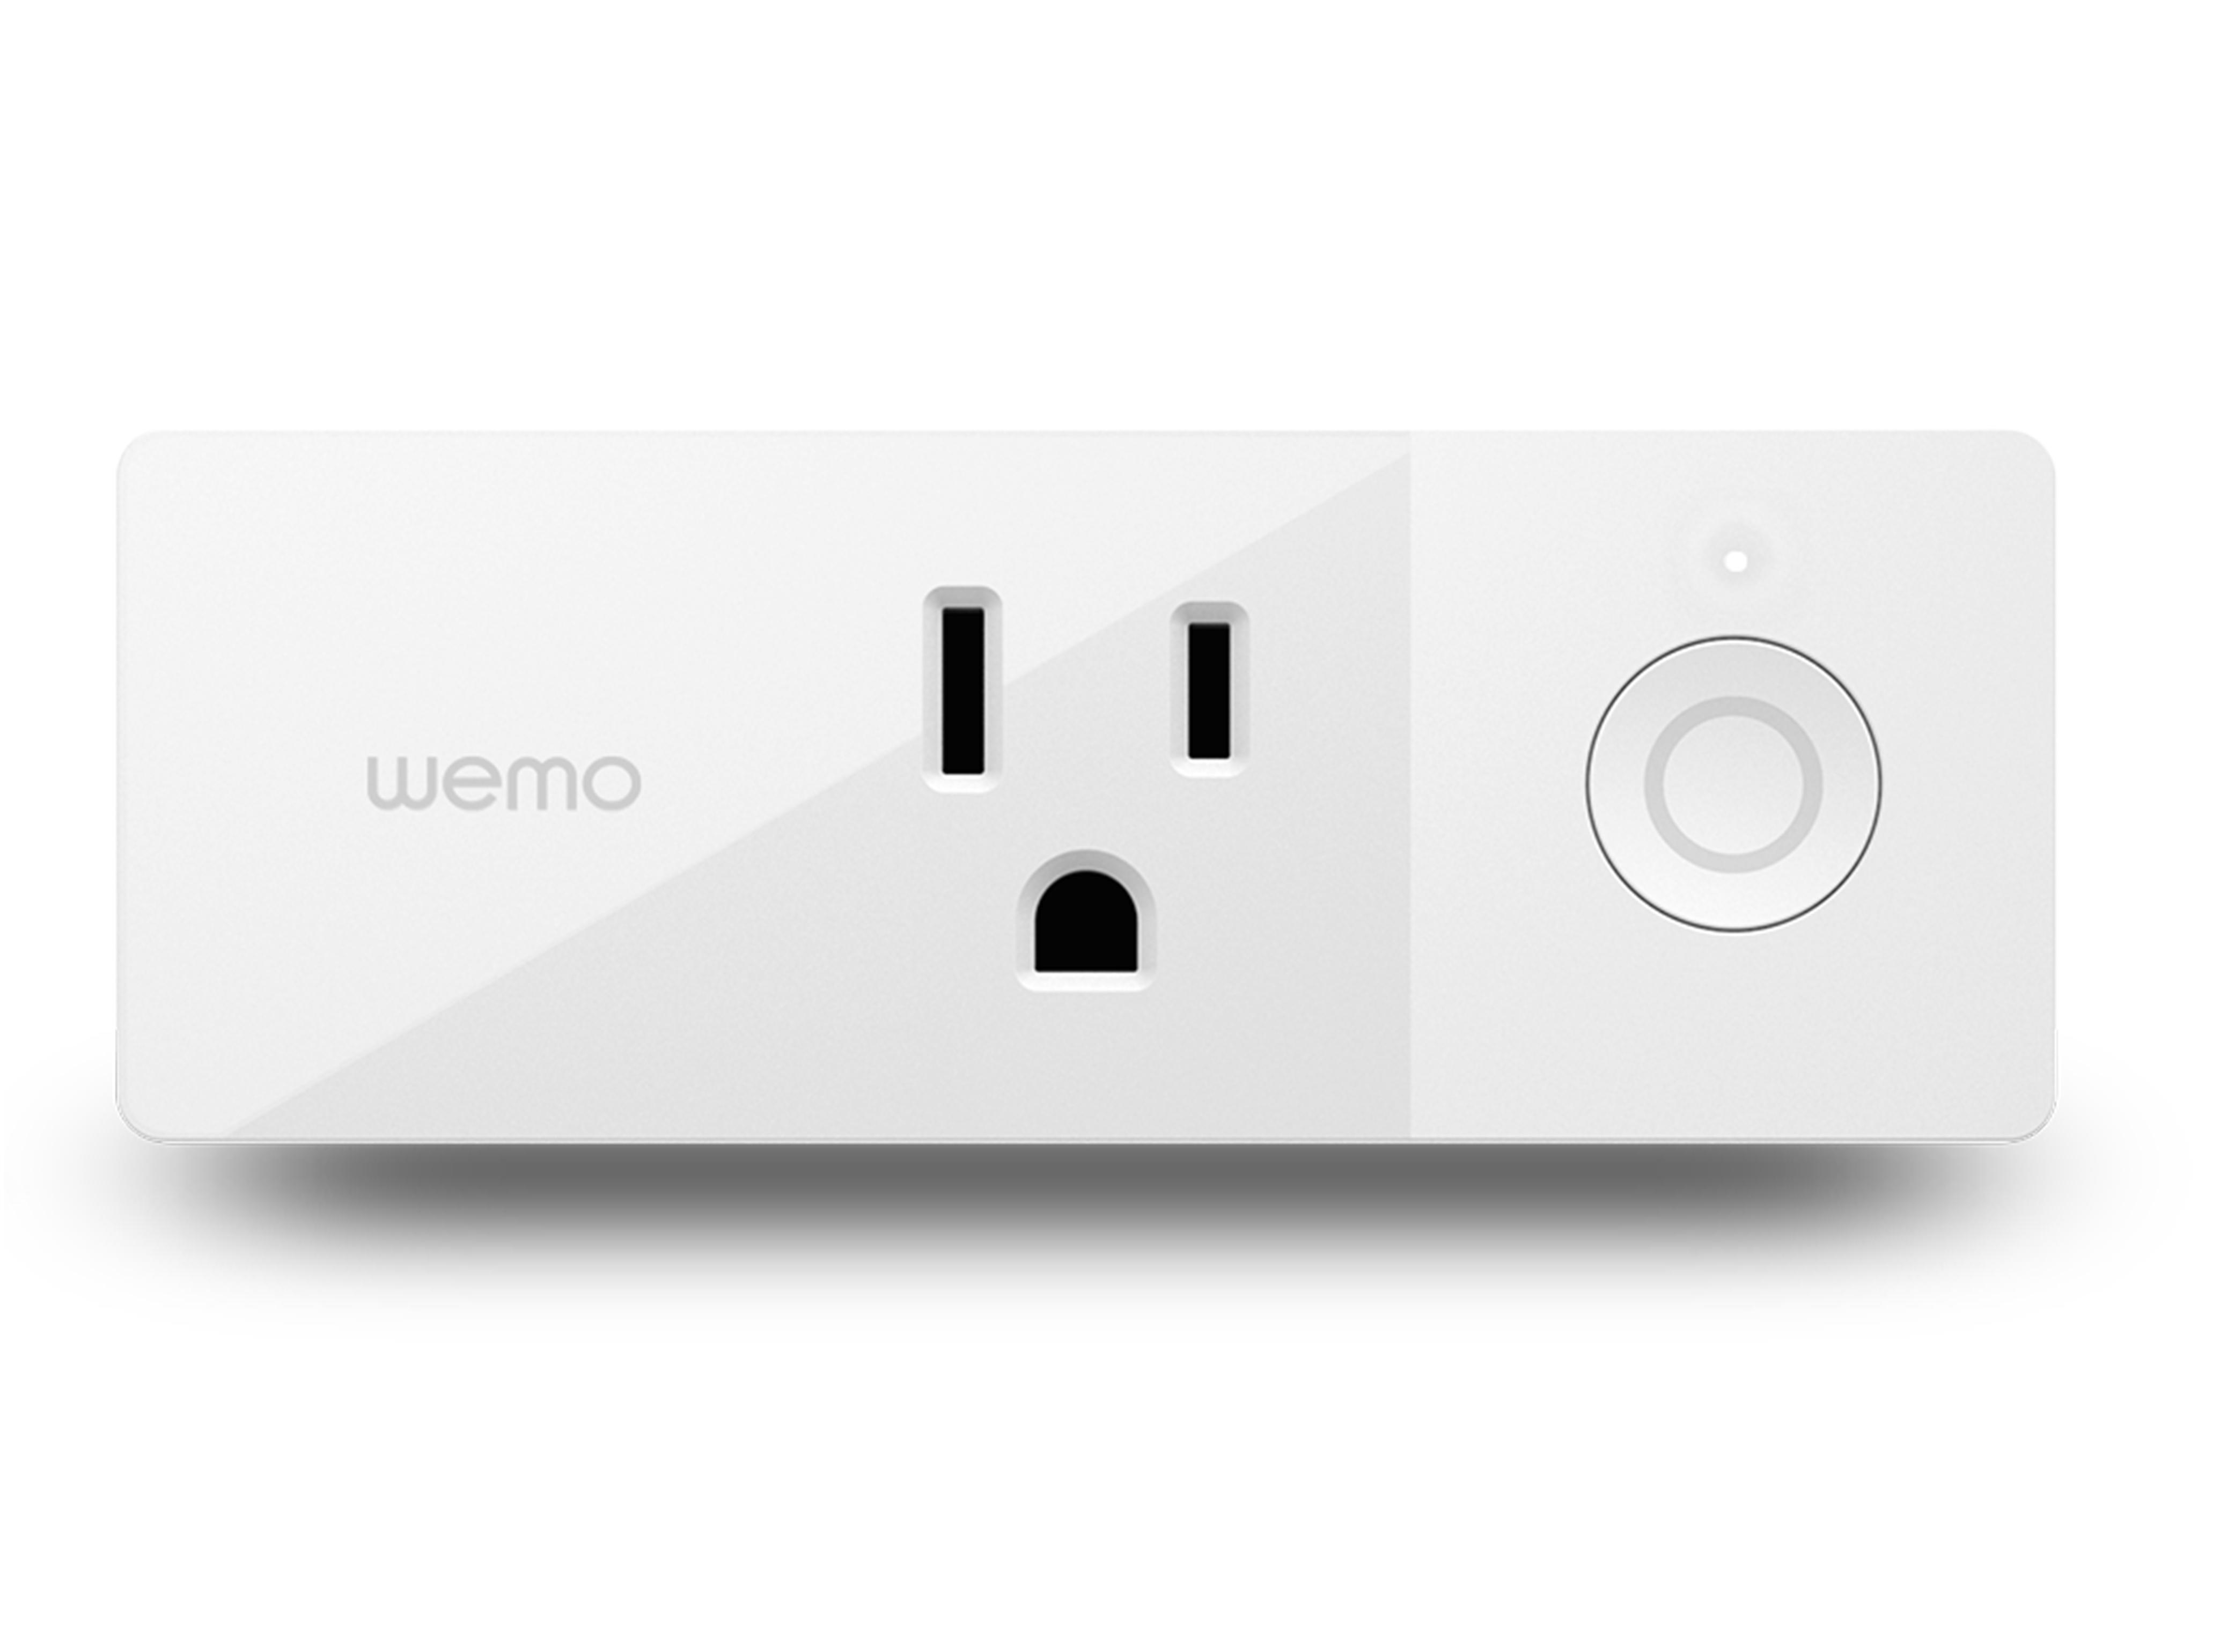 WEMO Press Reviews and Awards WEMO That